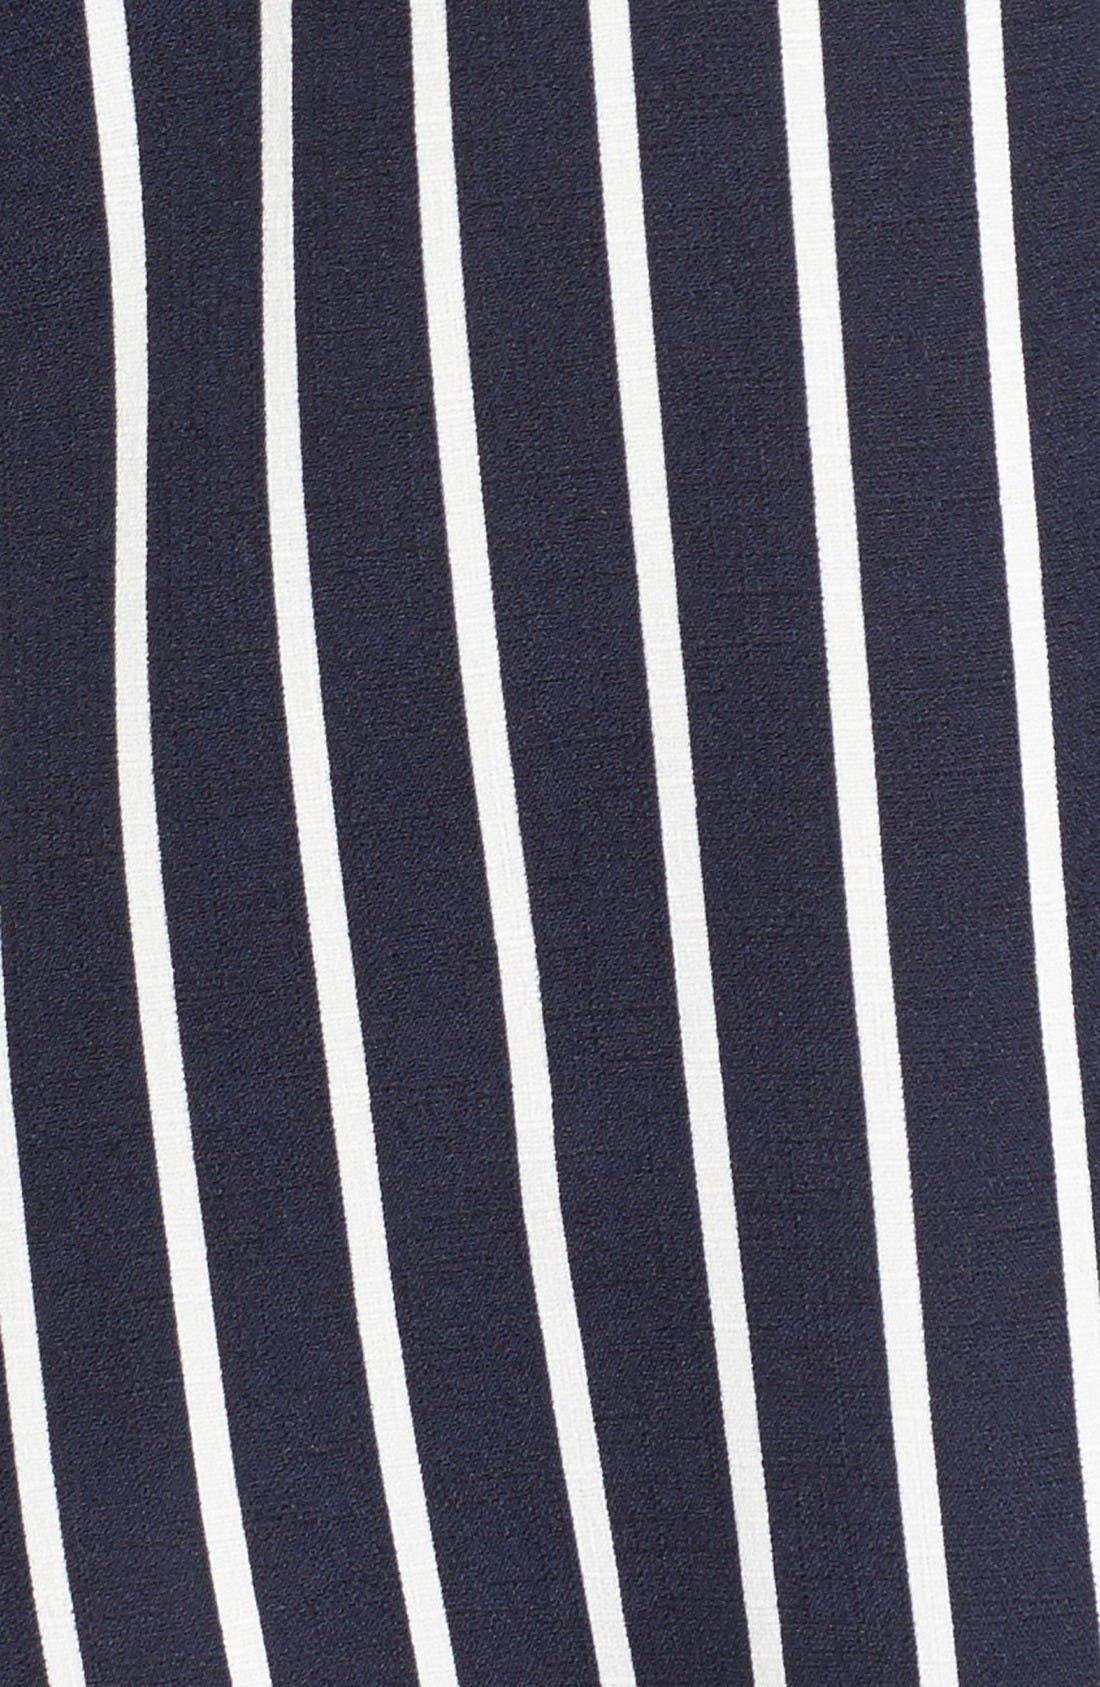 Alternate Image 5  - Pleione Off the Shoulder Shirt